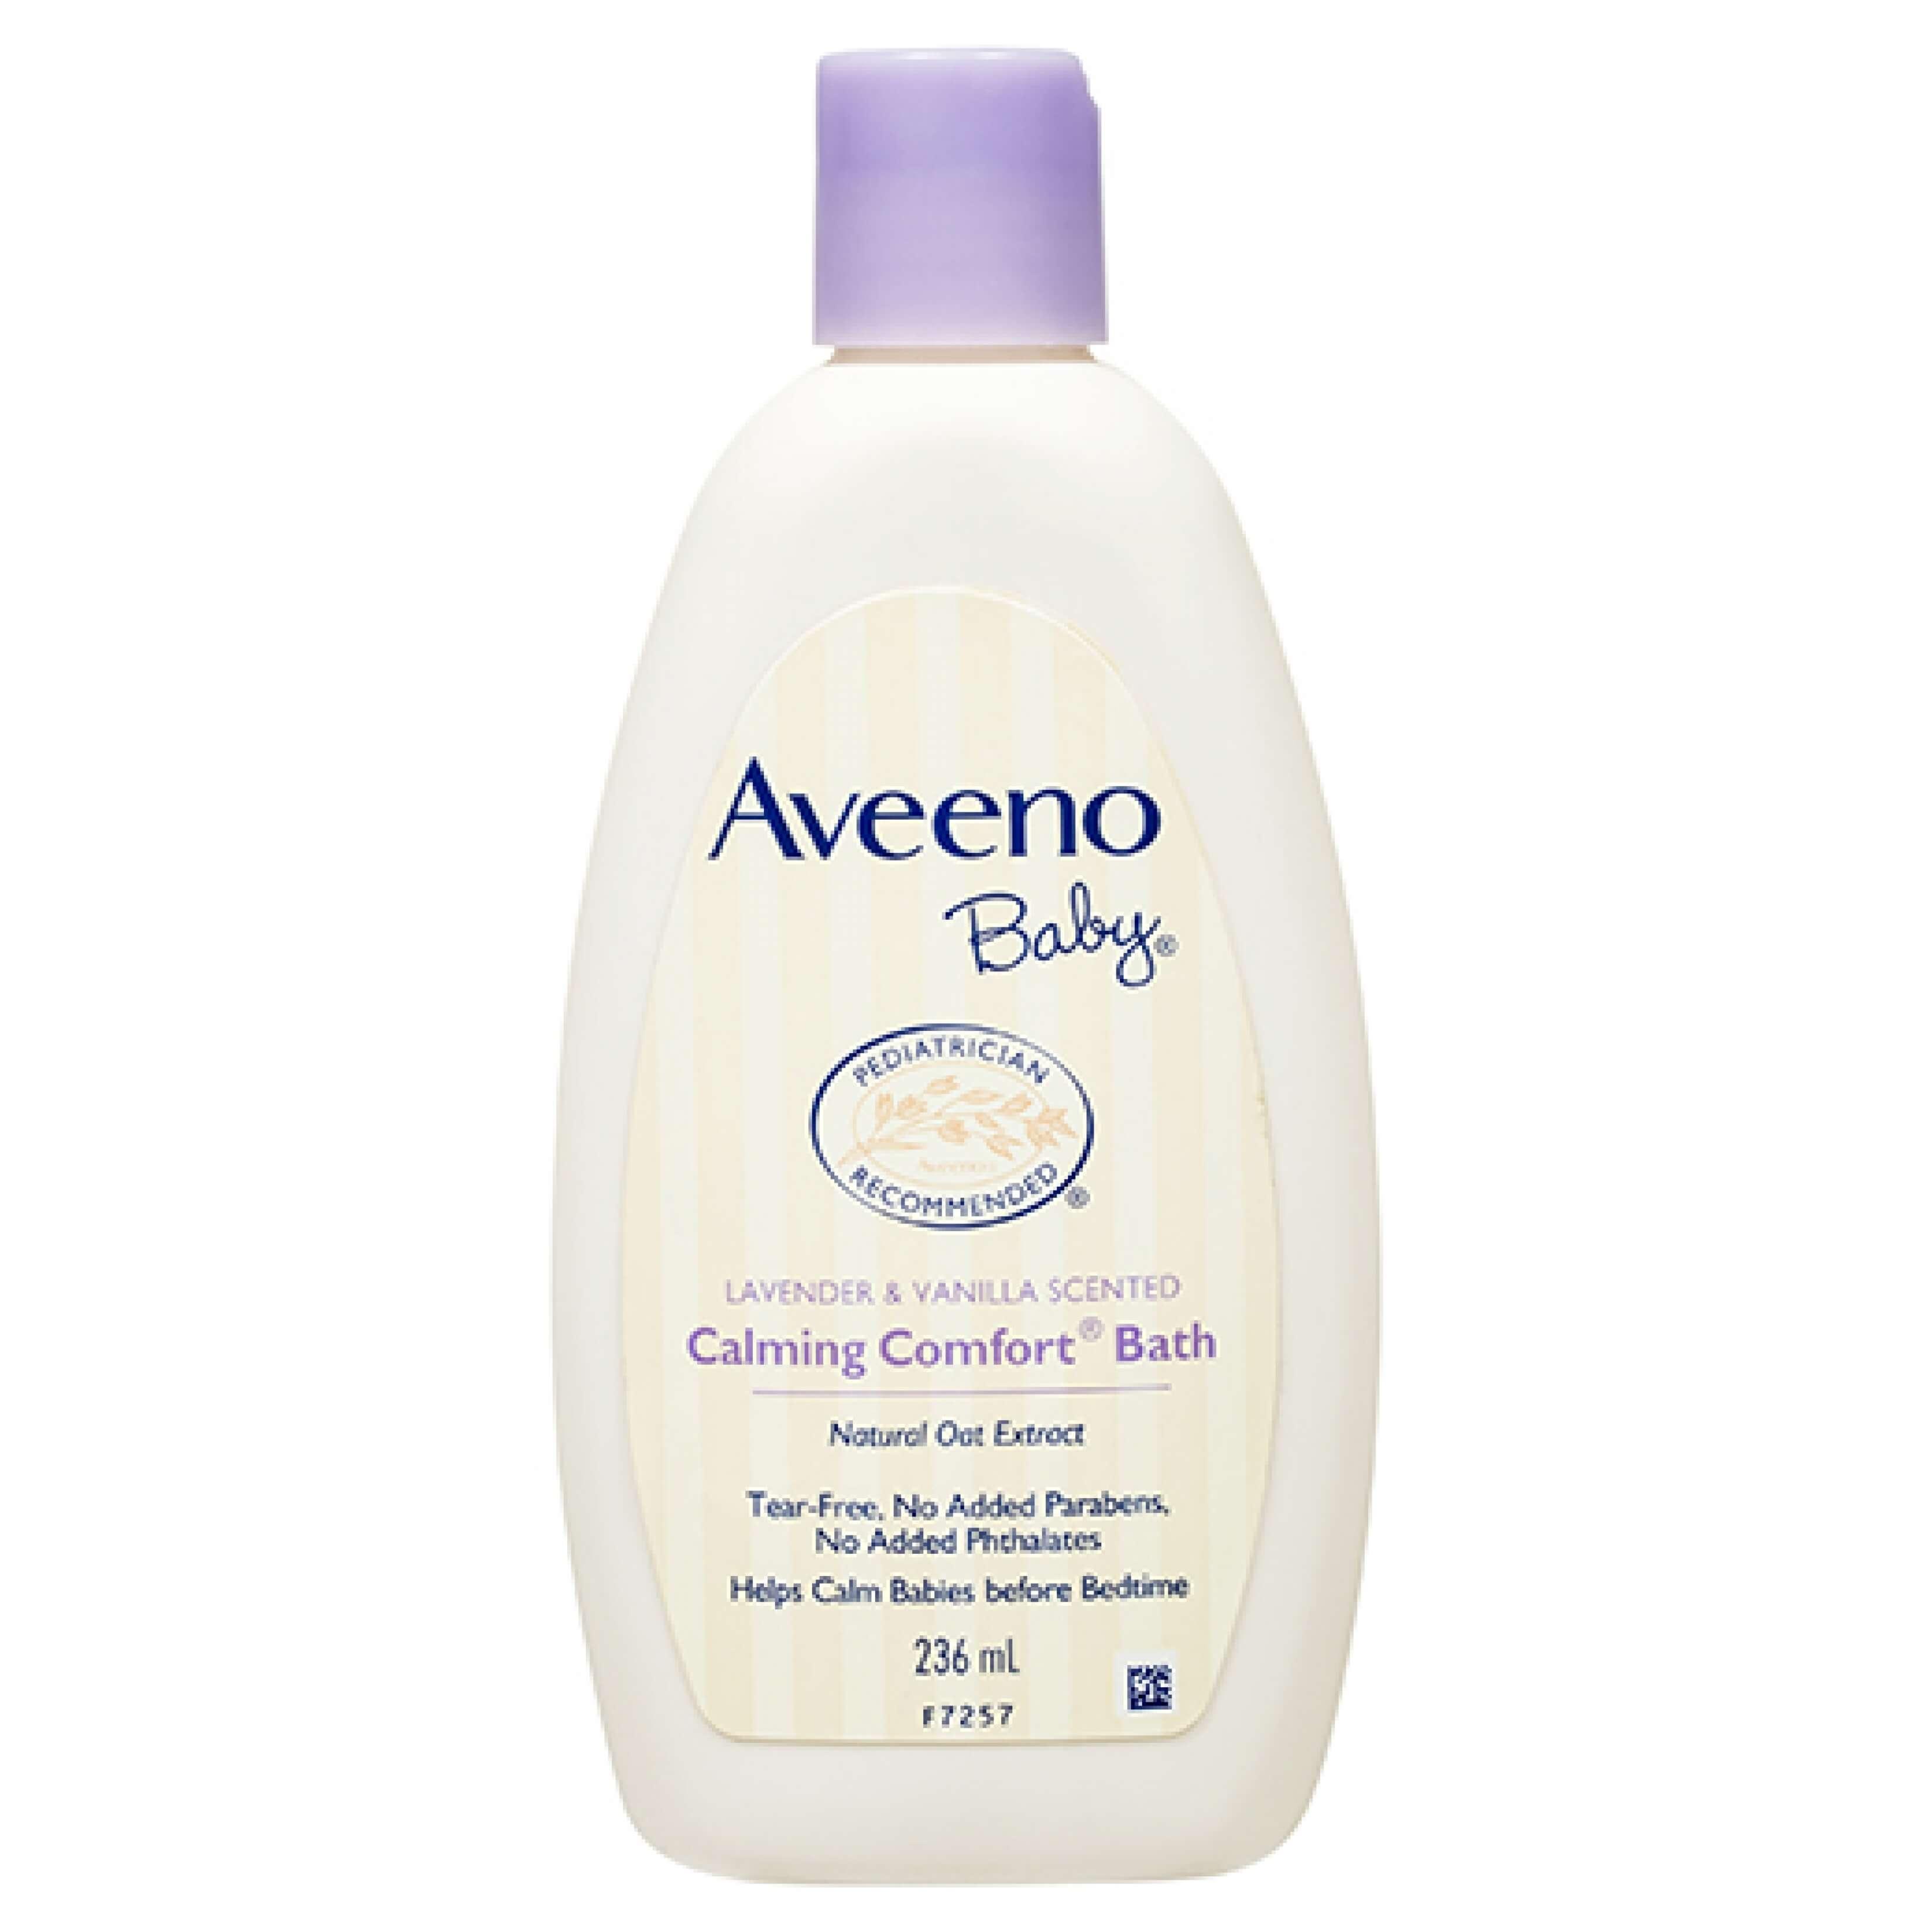 Aveeno Baby Calming Comfort Bath 236ml